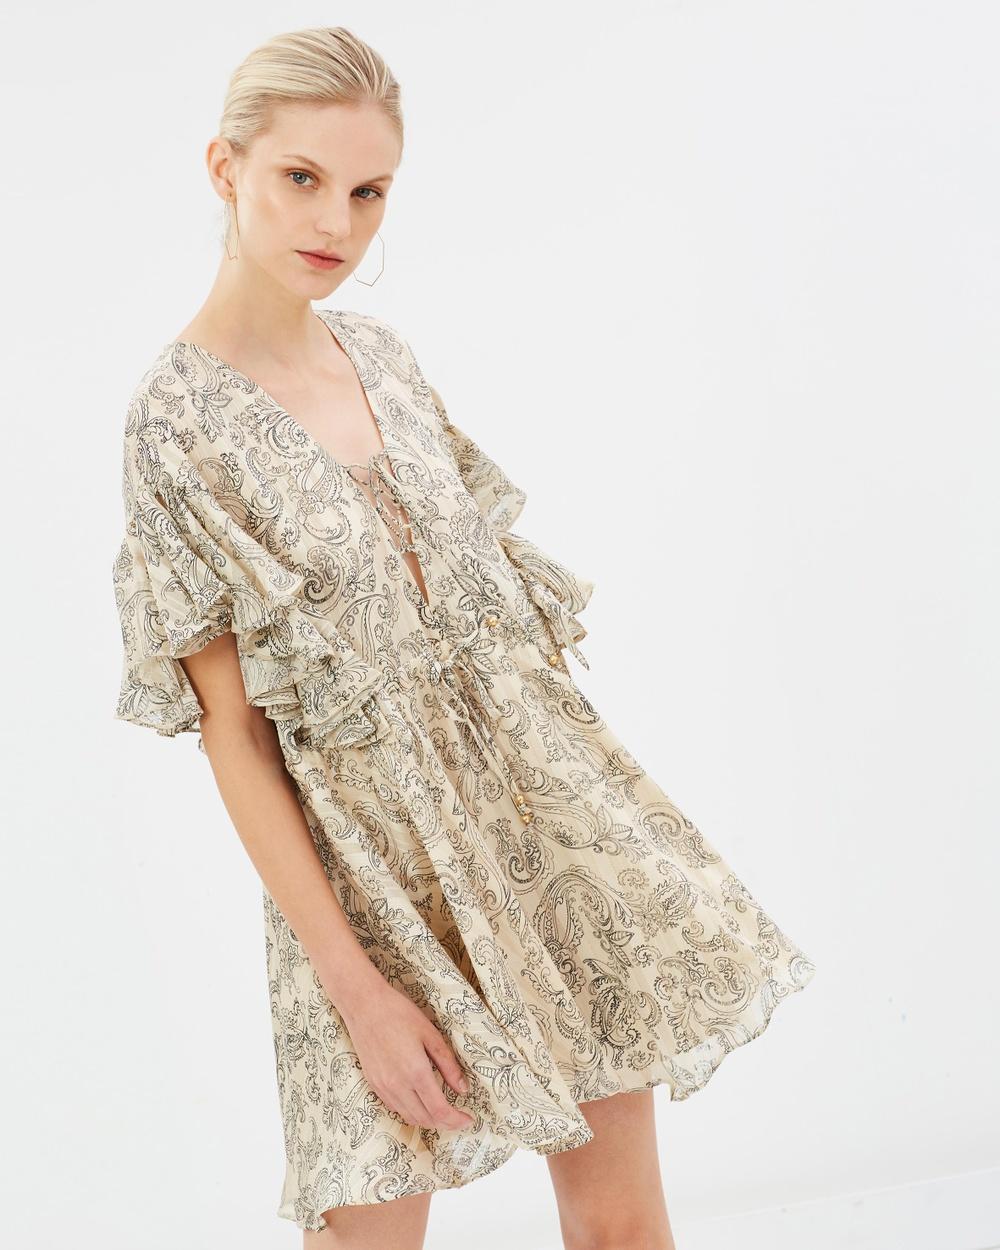 Shona Joy Marea Ruffle Mini Dress Printed Dresses Stone & Black Marea Ruffle Mini Dress